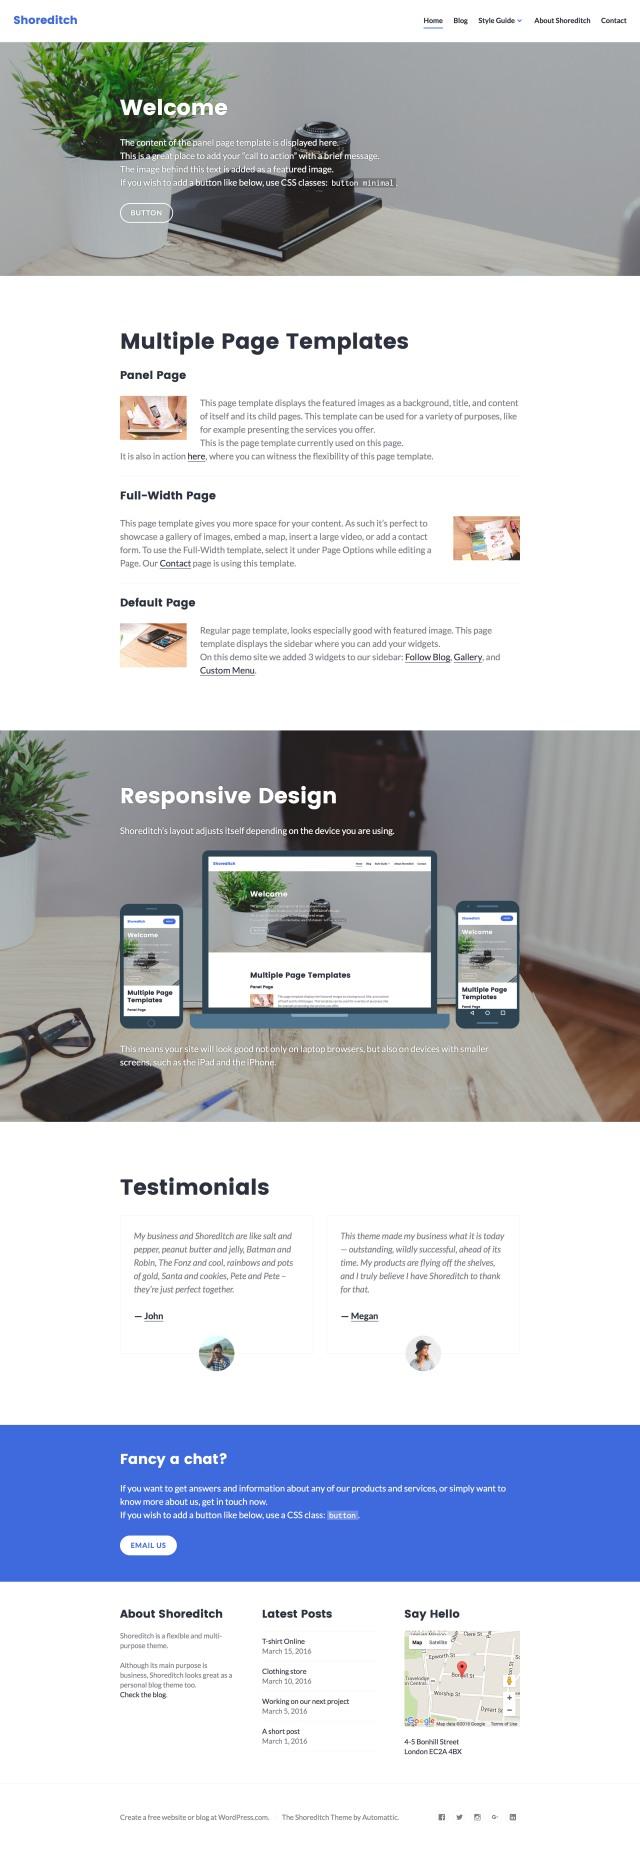 Shoreditch Theme — WordPress.com